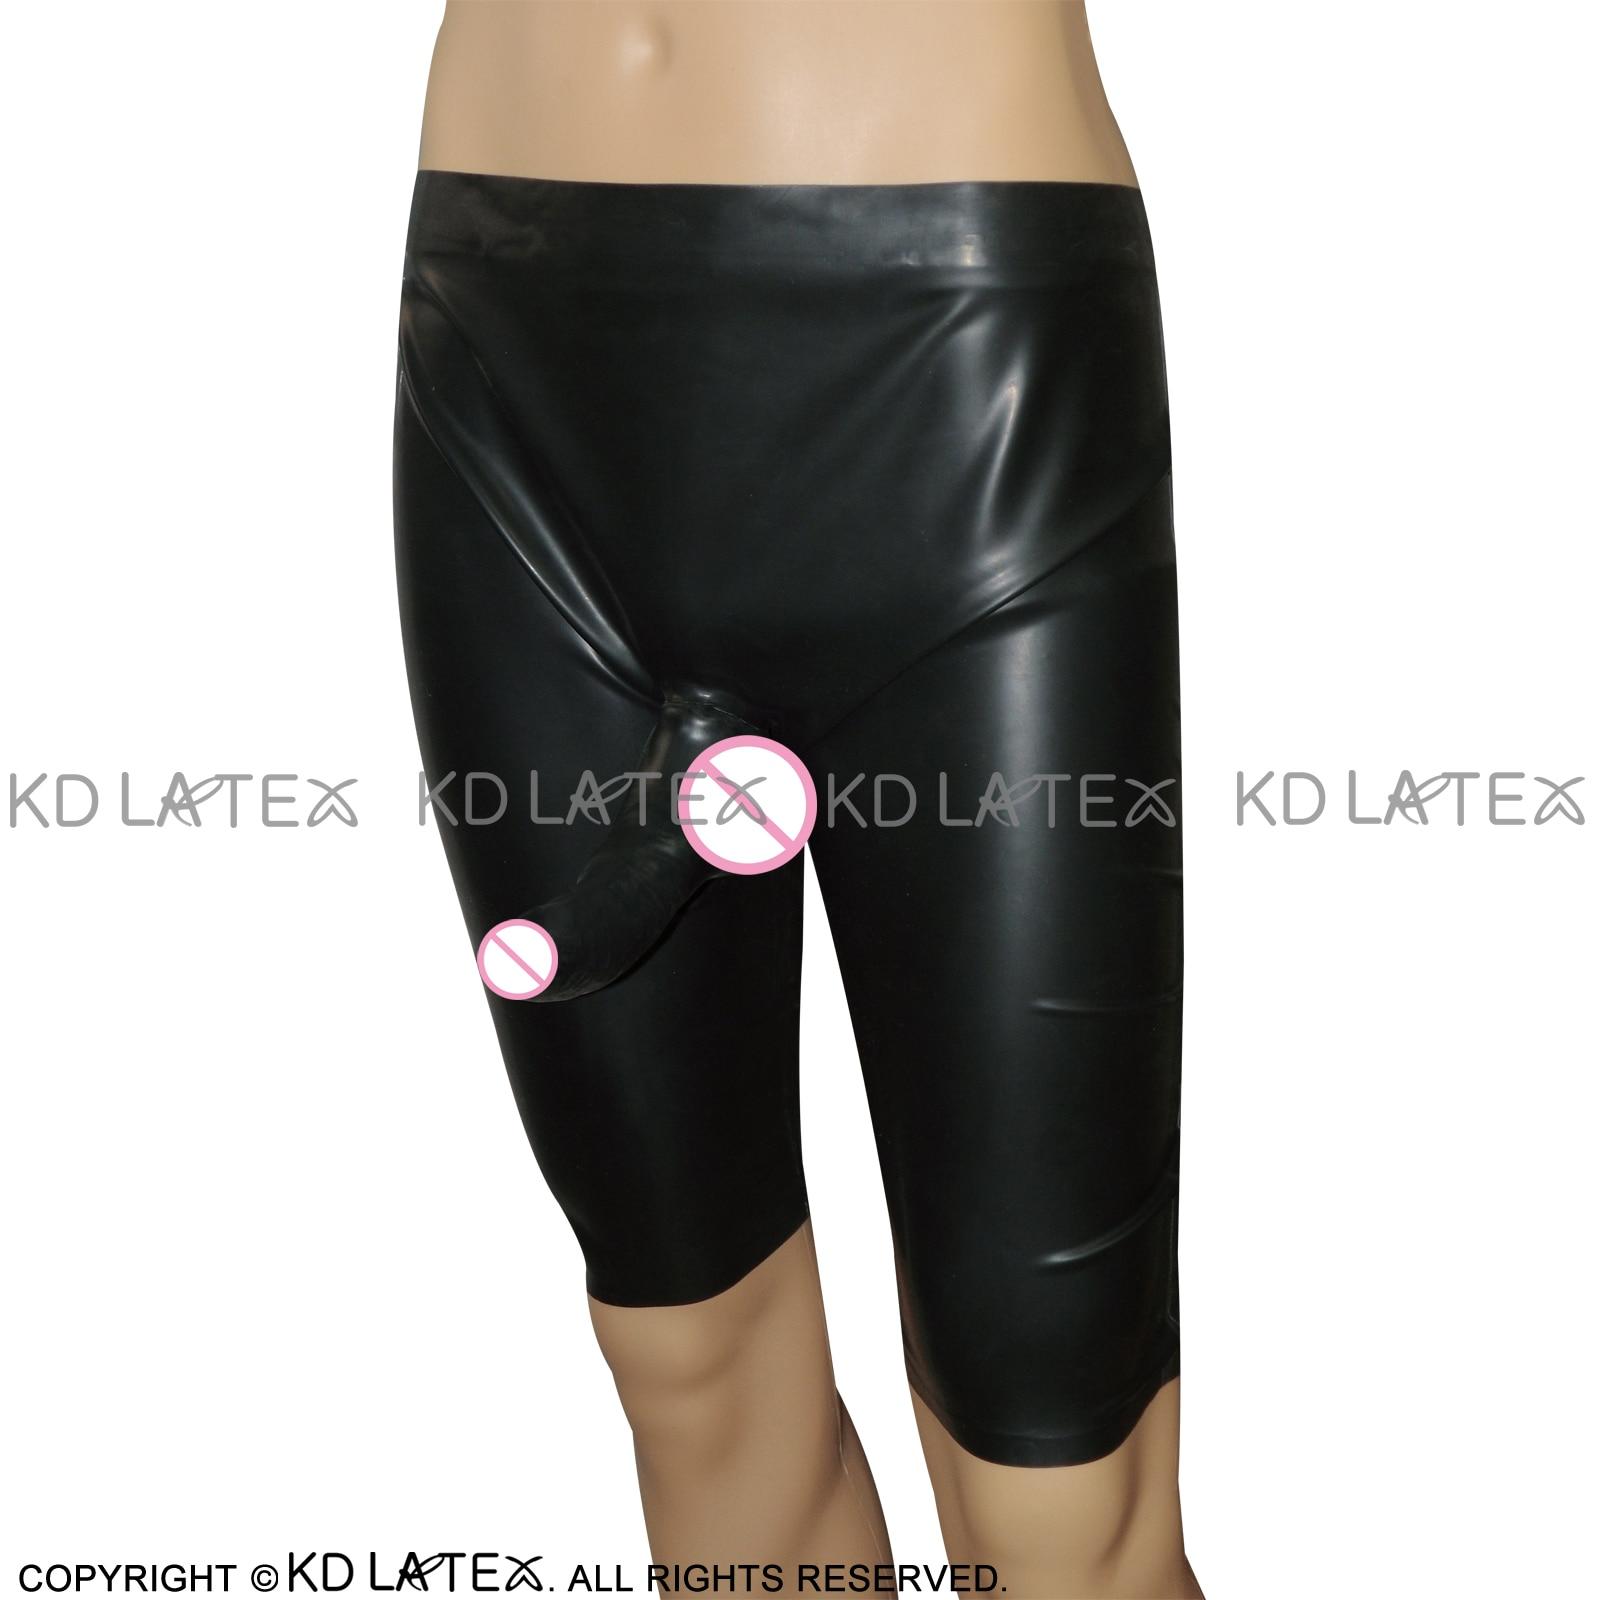 Black Latex Long Leg Boxer Shorts With Anatomical Penis Sheath Rubber Underwear DK-0027